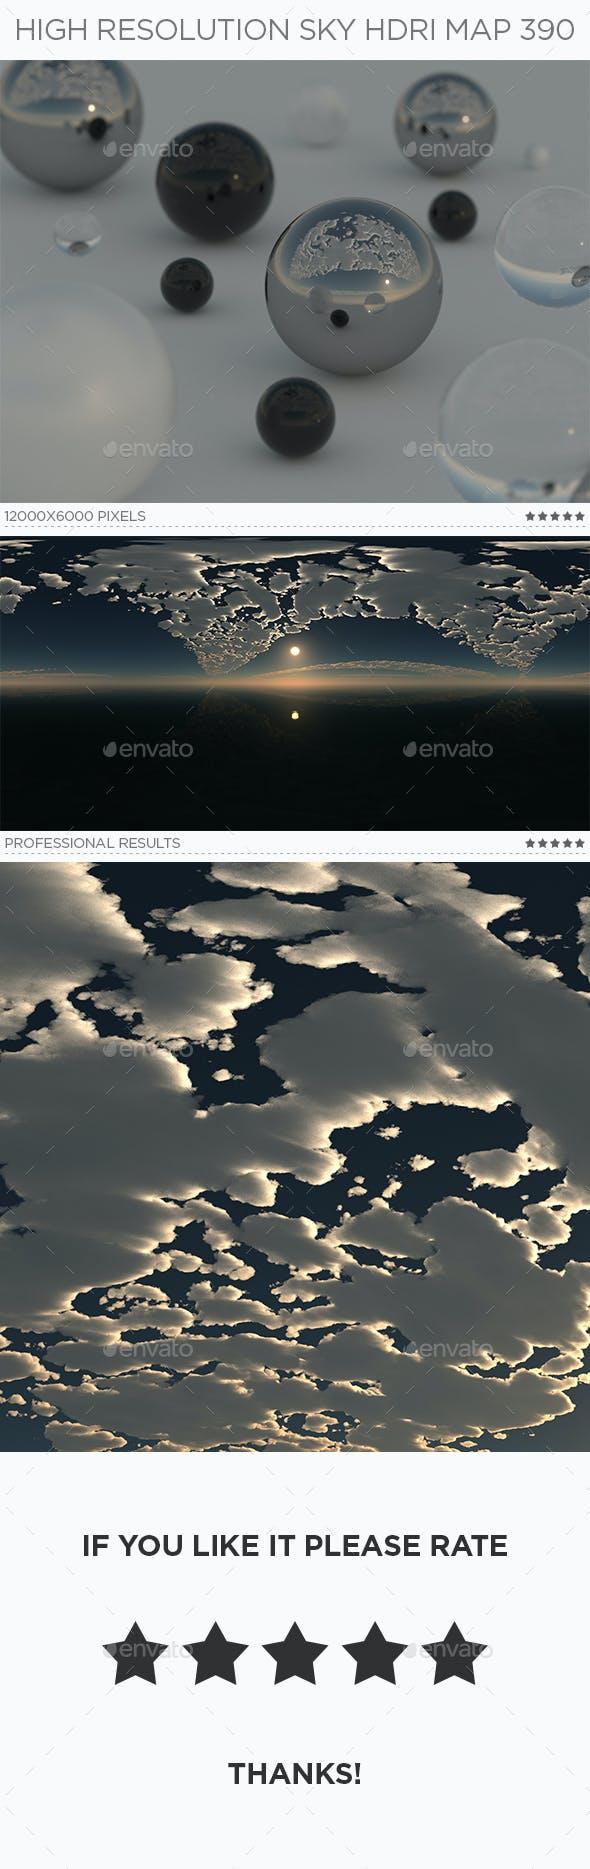 High Resolution Sky HDRi Map 390 - 3DOcean Item for Sale